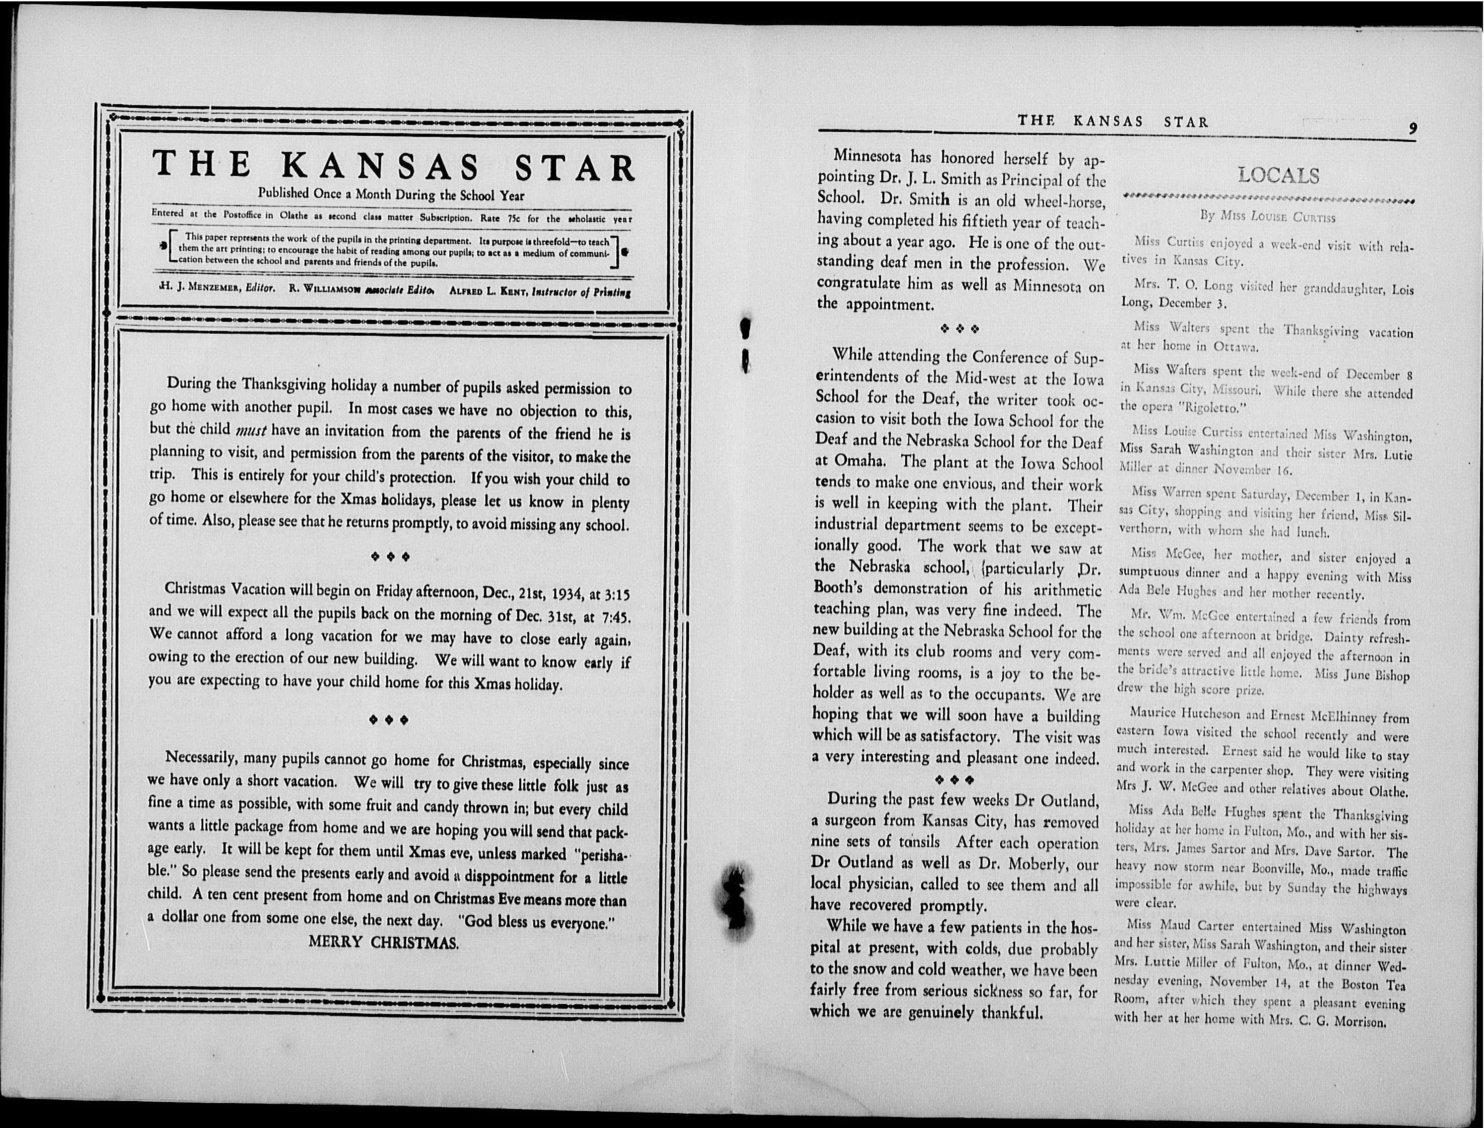 The Kansas Star, volume 58, number 3 - 8-9